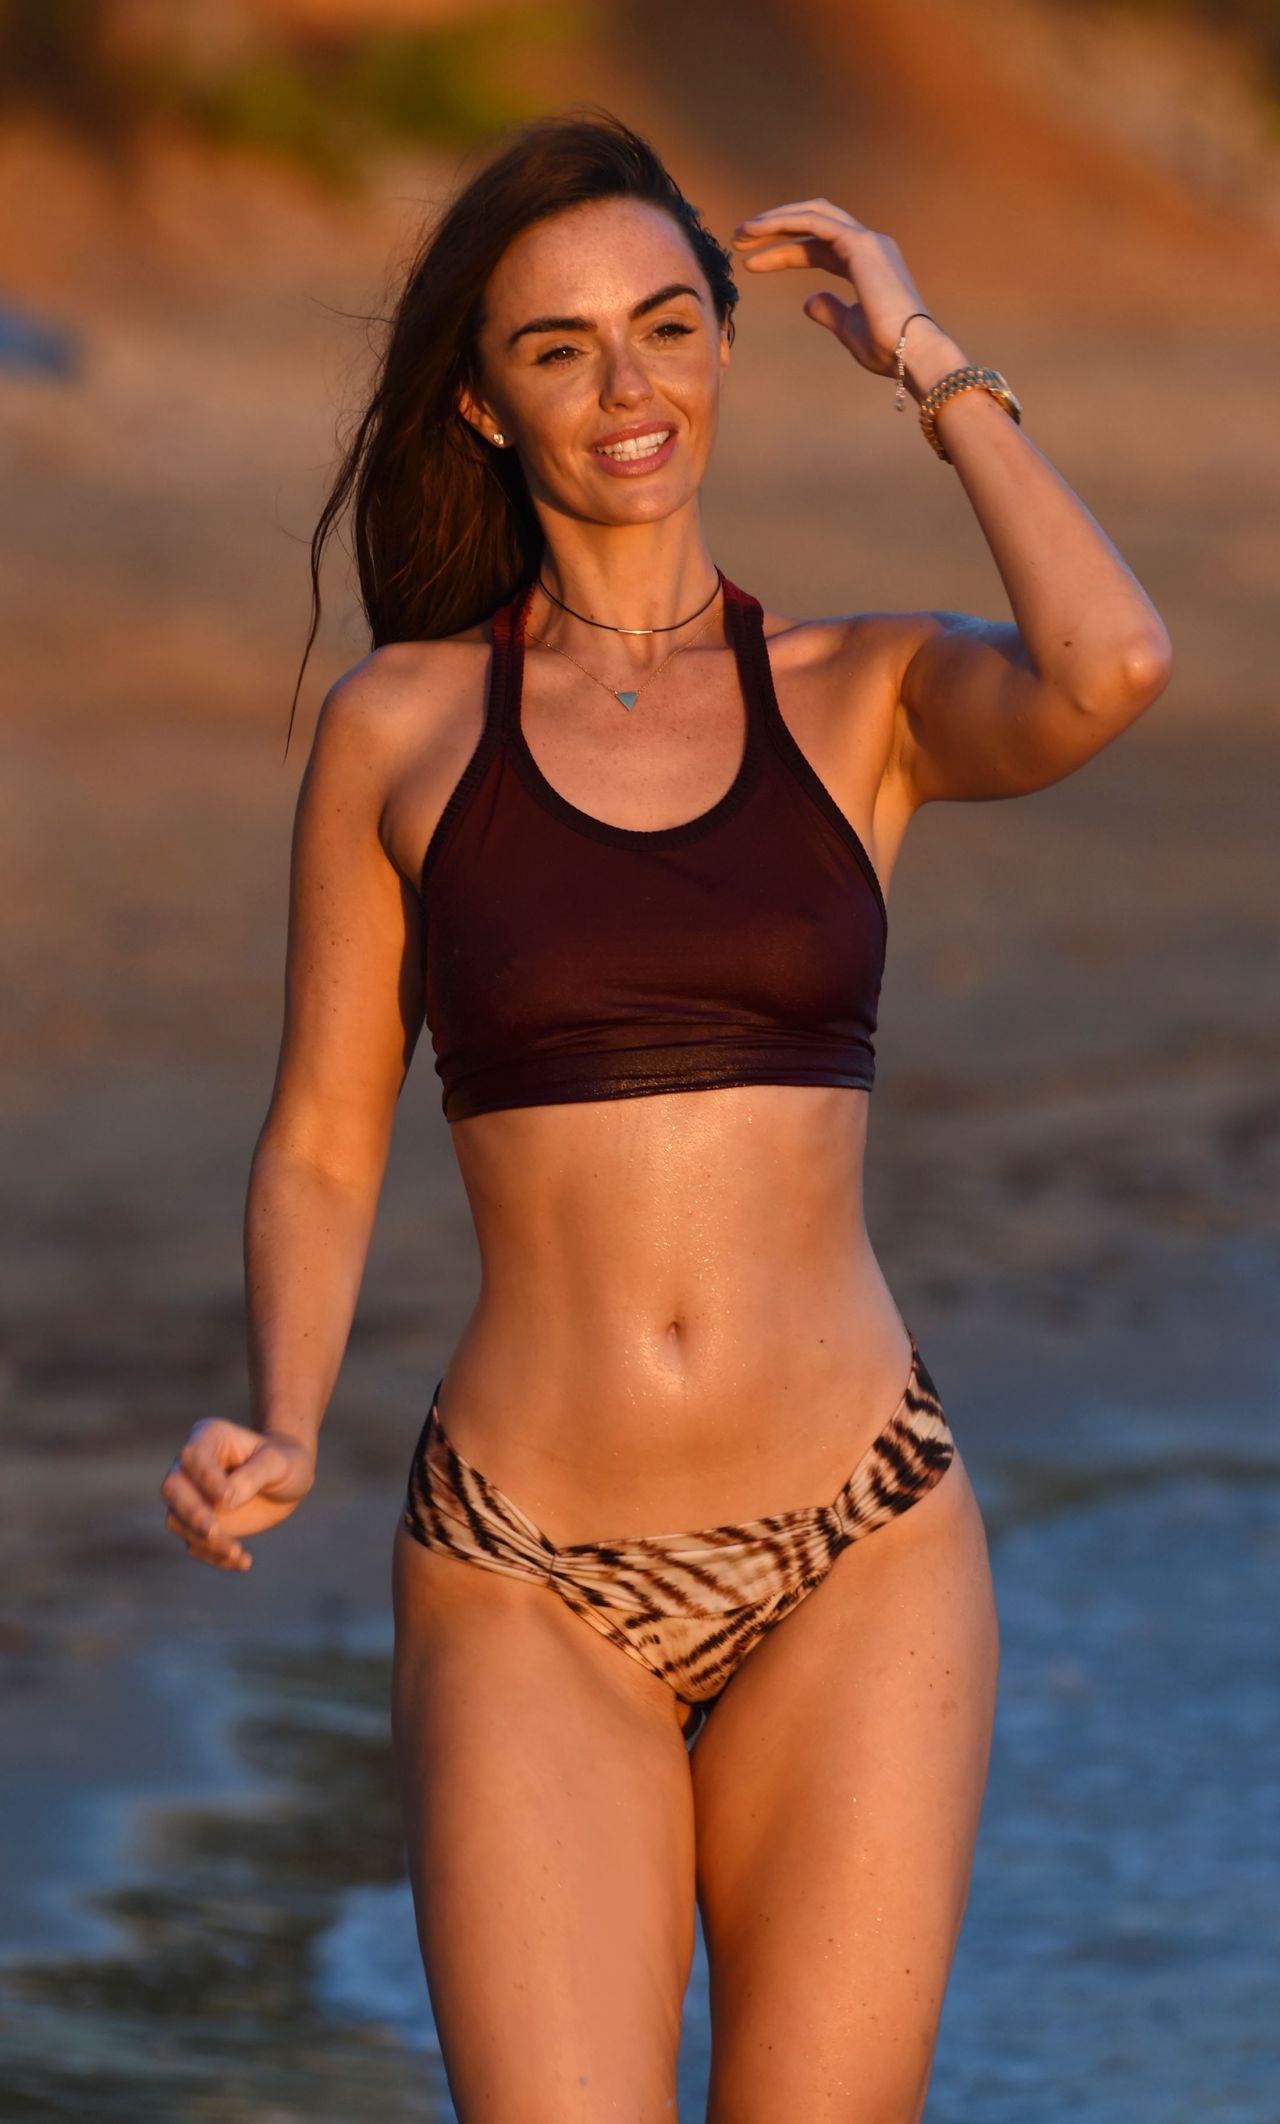 Bikini Jennifer Metcalfe nude (51 photo), Sexy, Cleavage, Feet, cleavage 2020